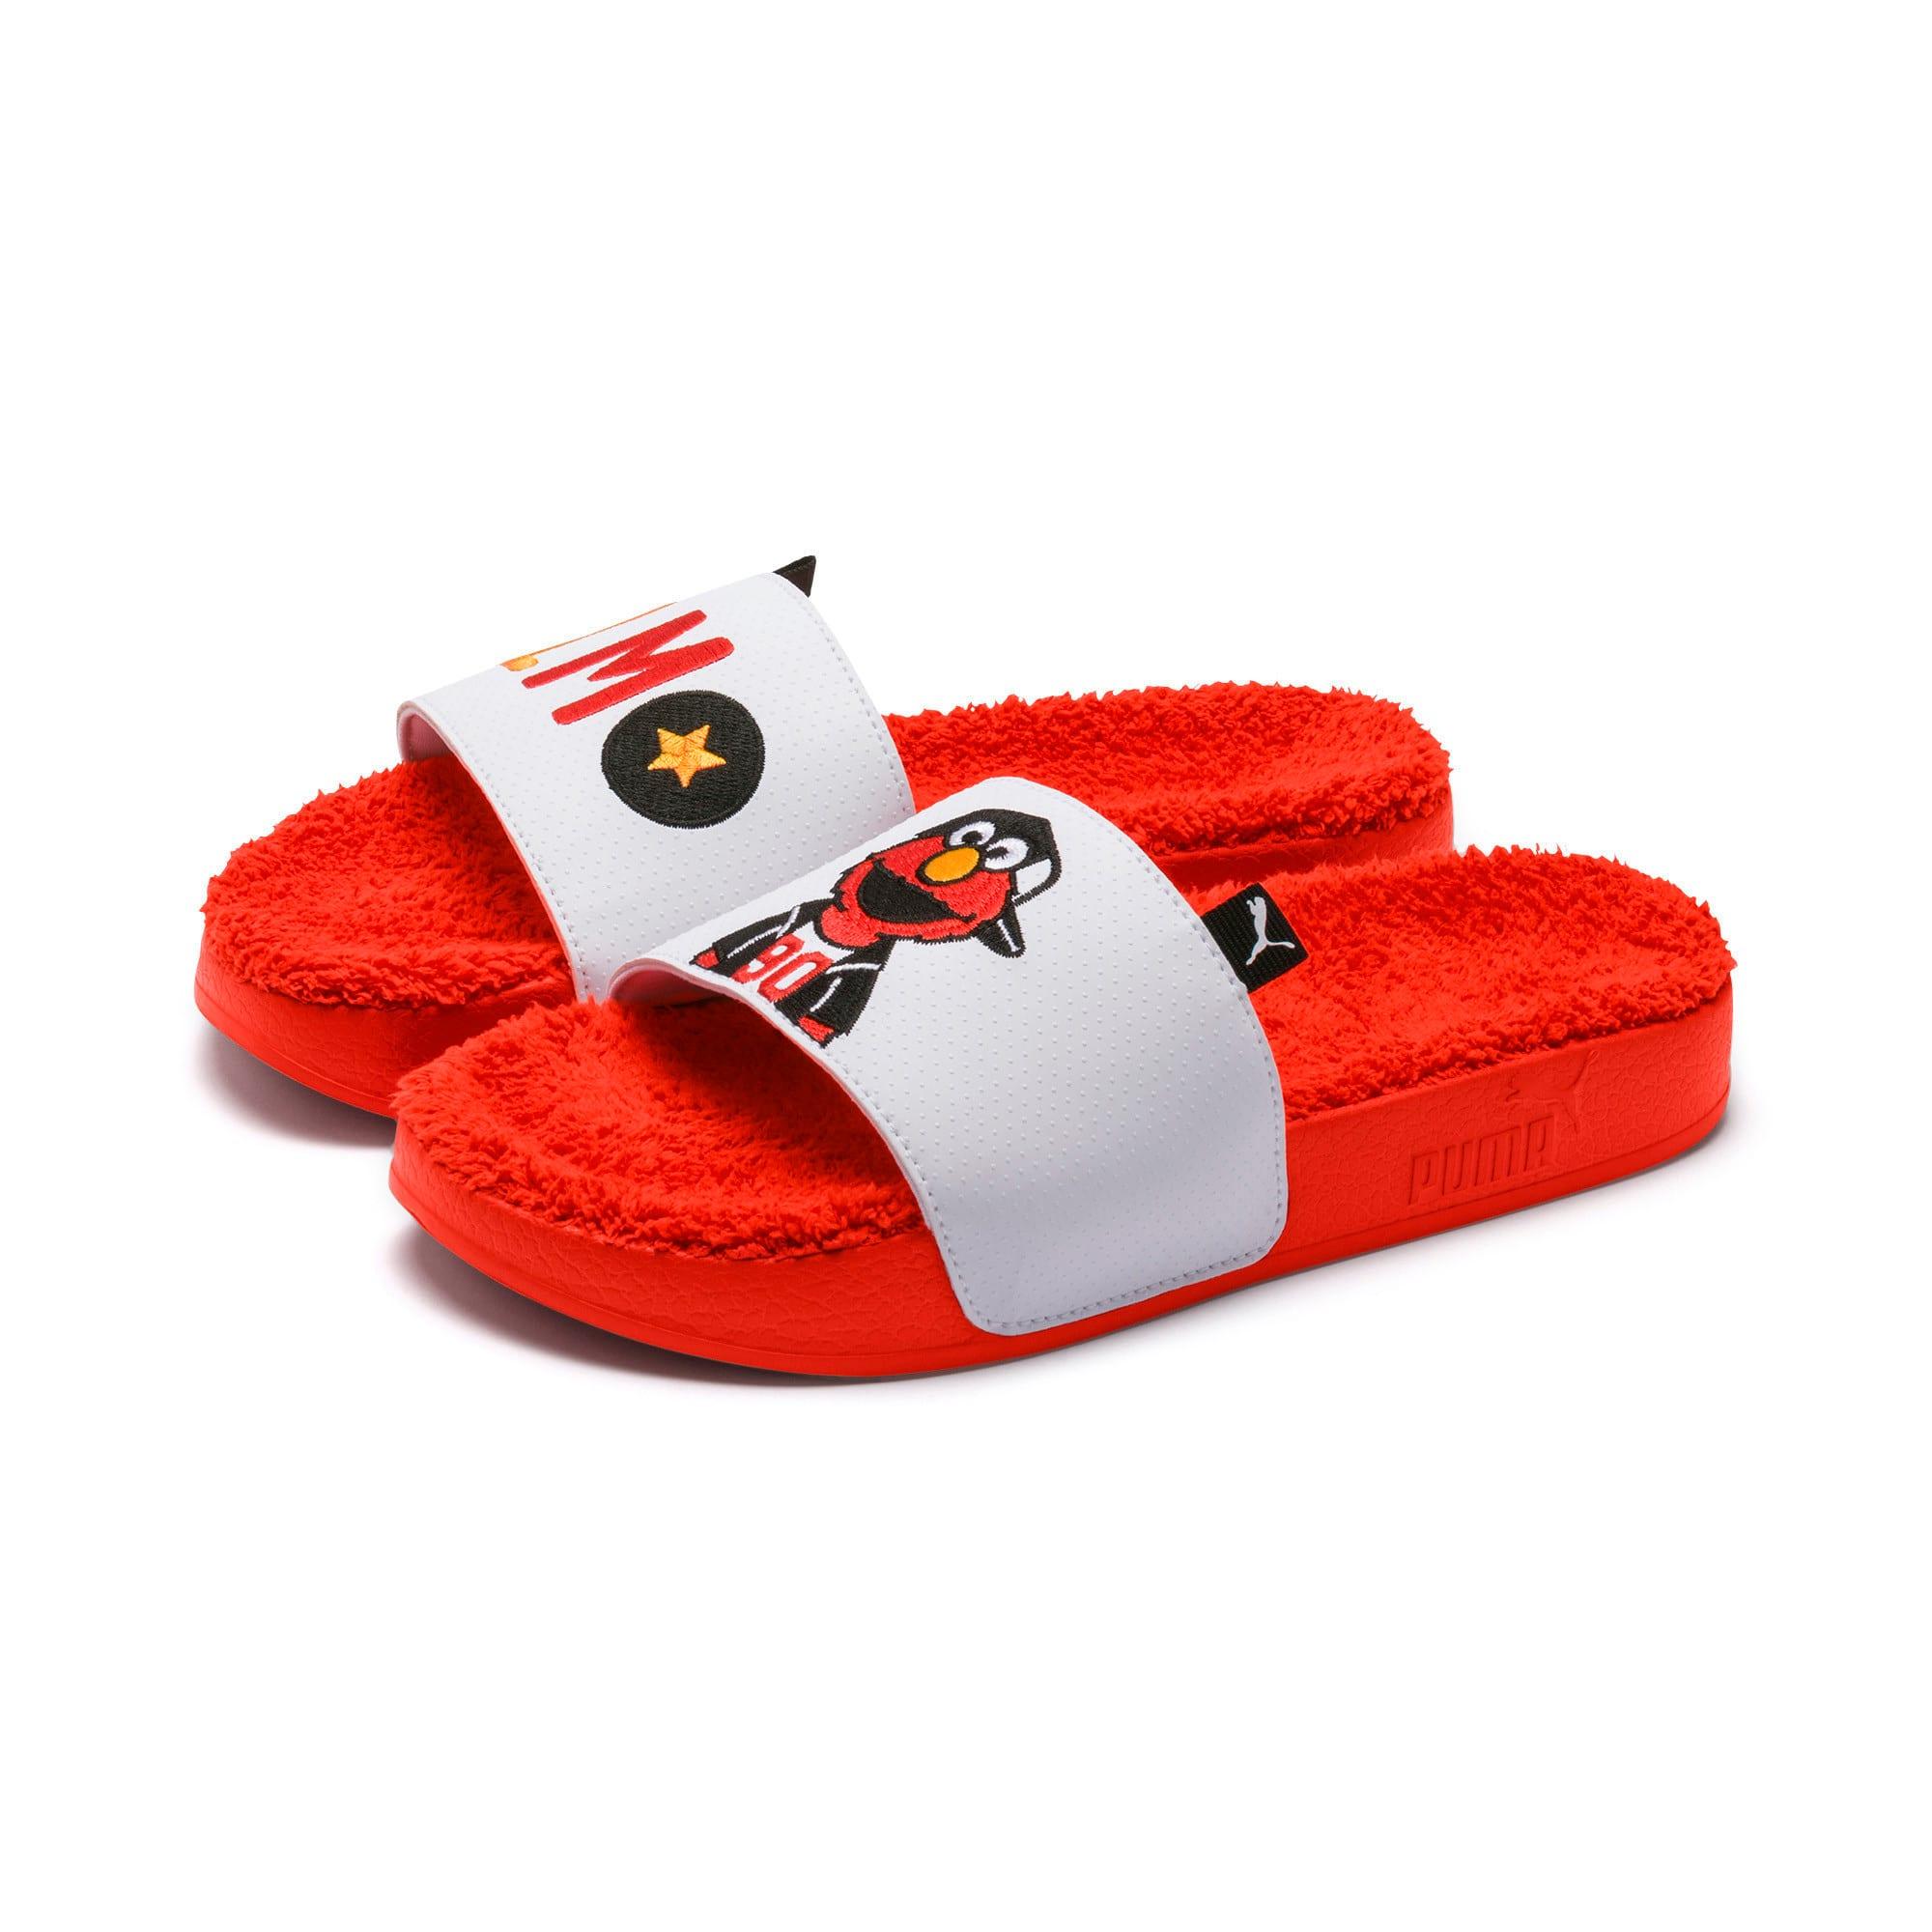 Thumbnail 7 of Sesame Street Kids' Leadcat Sandals, Cherry Tomato-Puma White, medium-IND